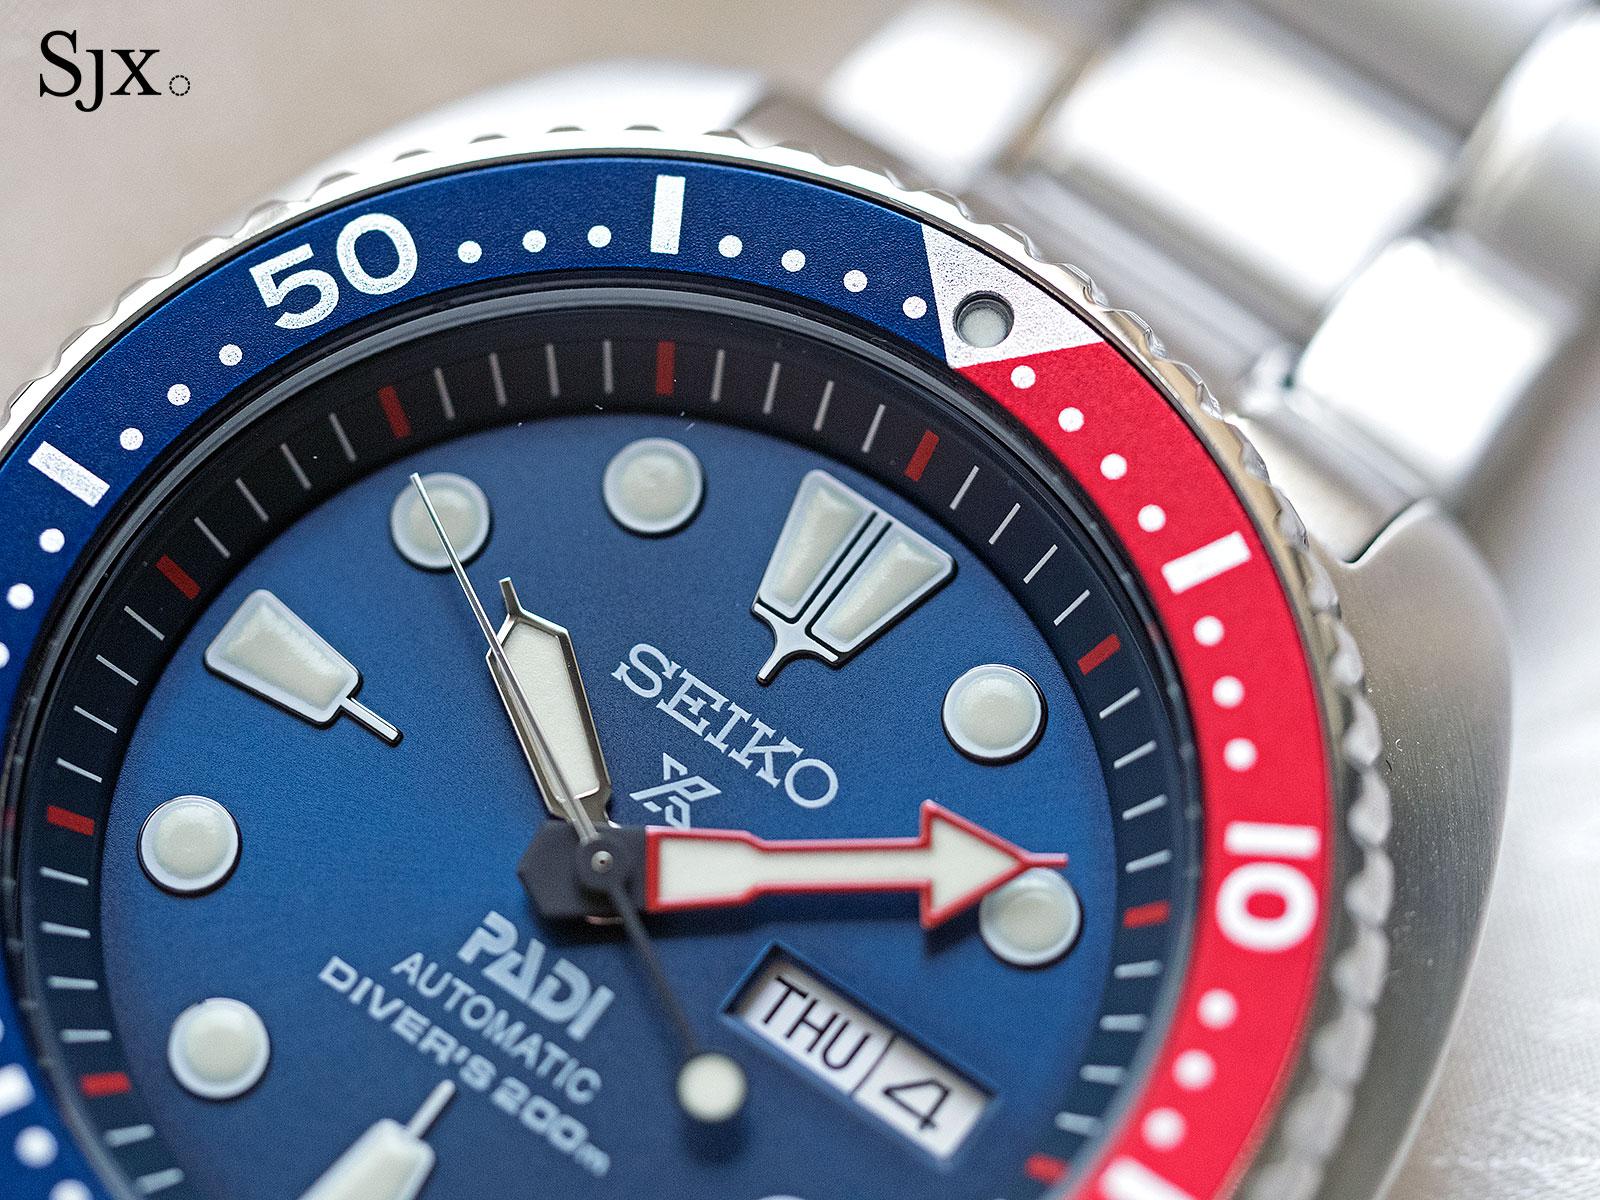 Seiko PADI Diver SRPA21-K1 3